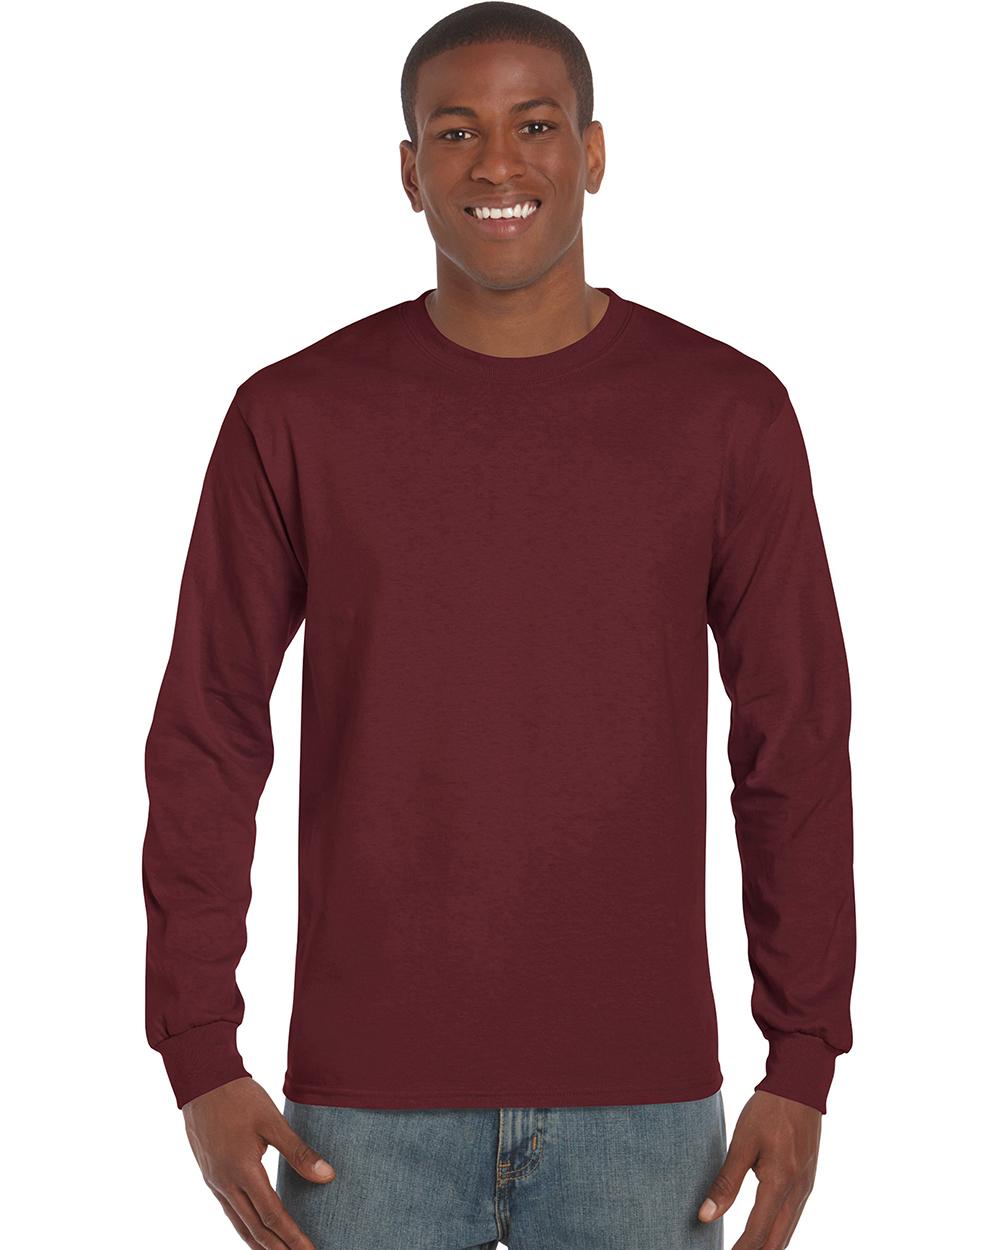 Gildan 2400GL     Ultra Cotton™    Classic Fit Adult Long Sleeve T-Shirt    6.0 oz. 100% Cotton